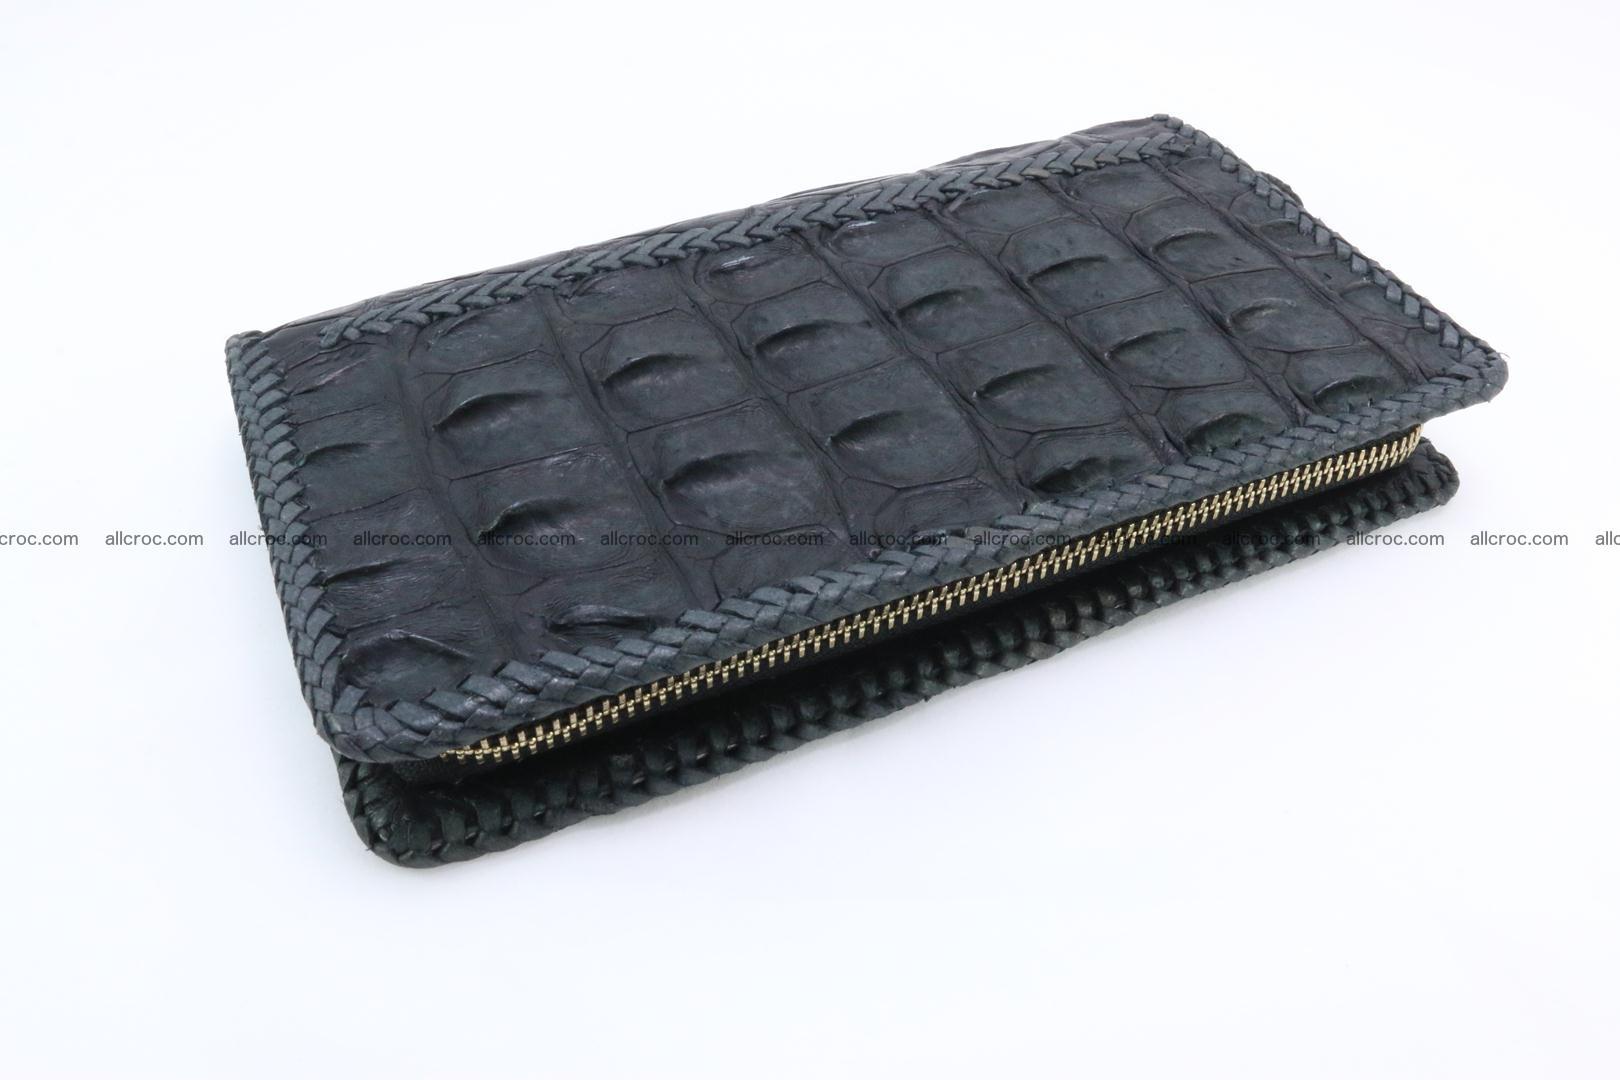 Genuine crocodile hornback wallet with zip 099 Foto 12